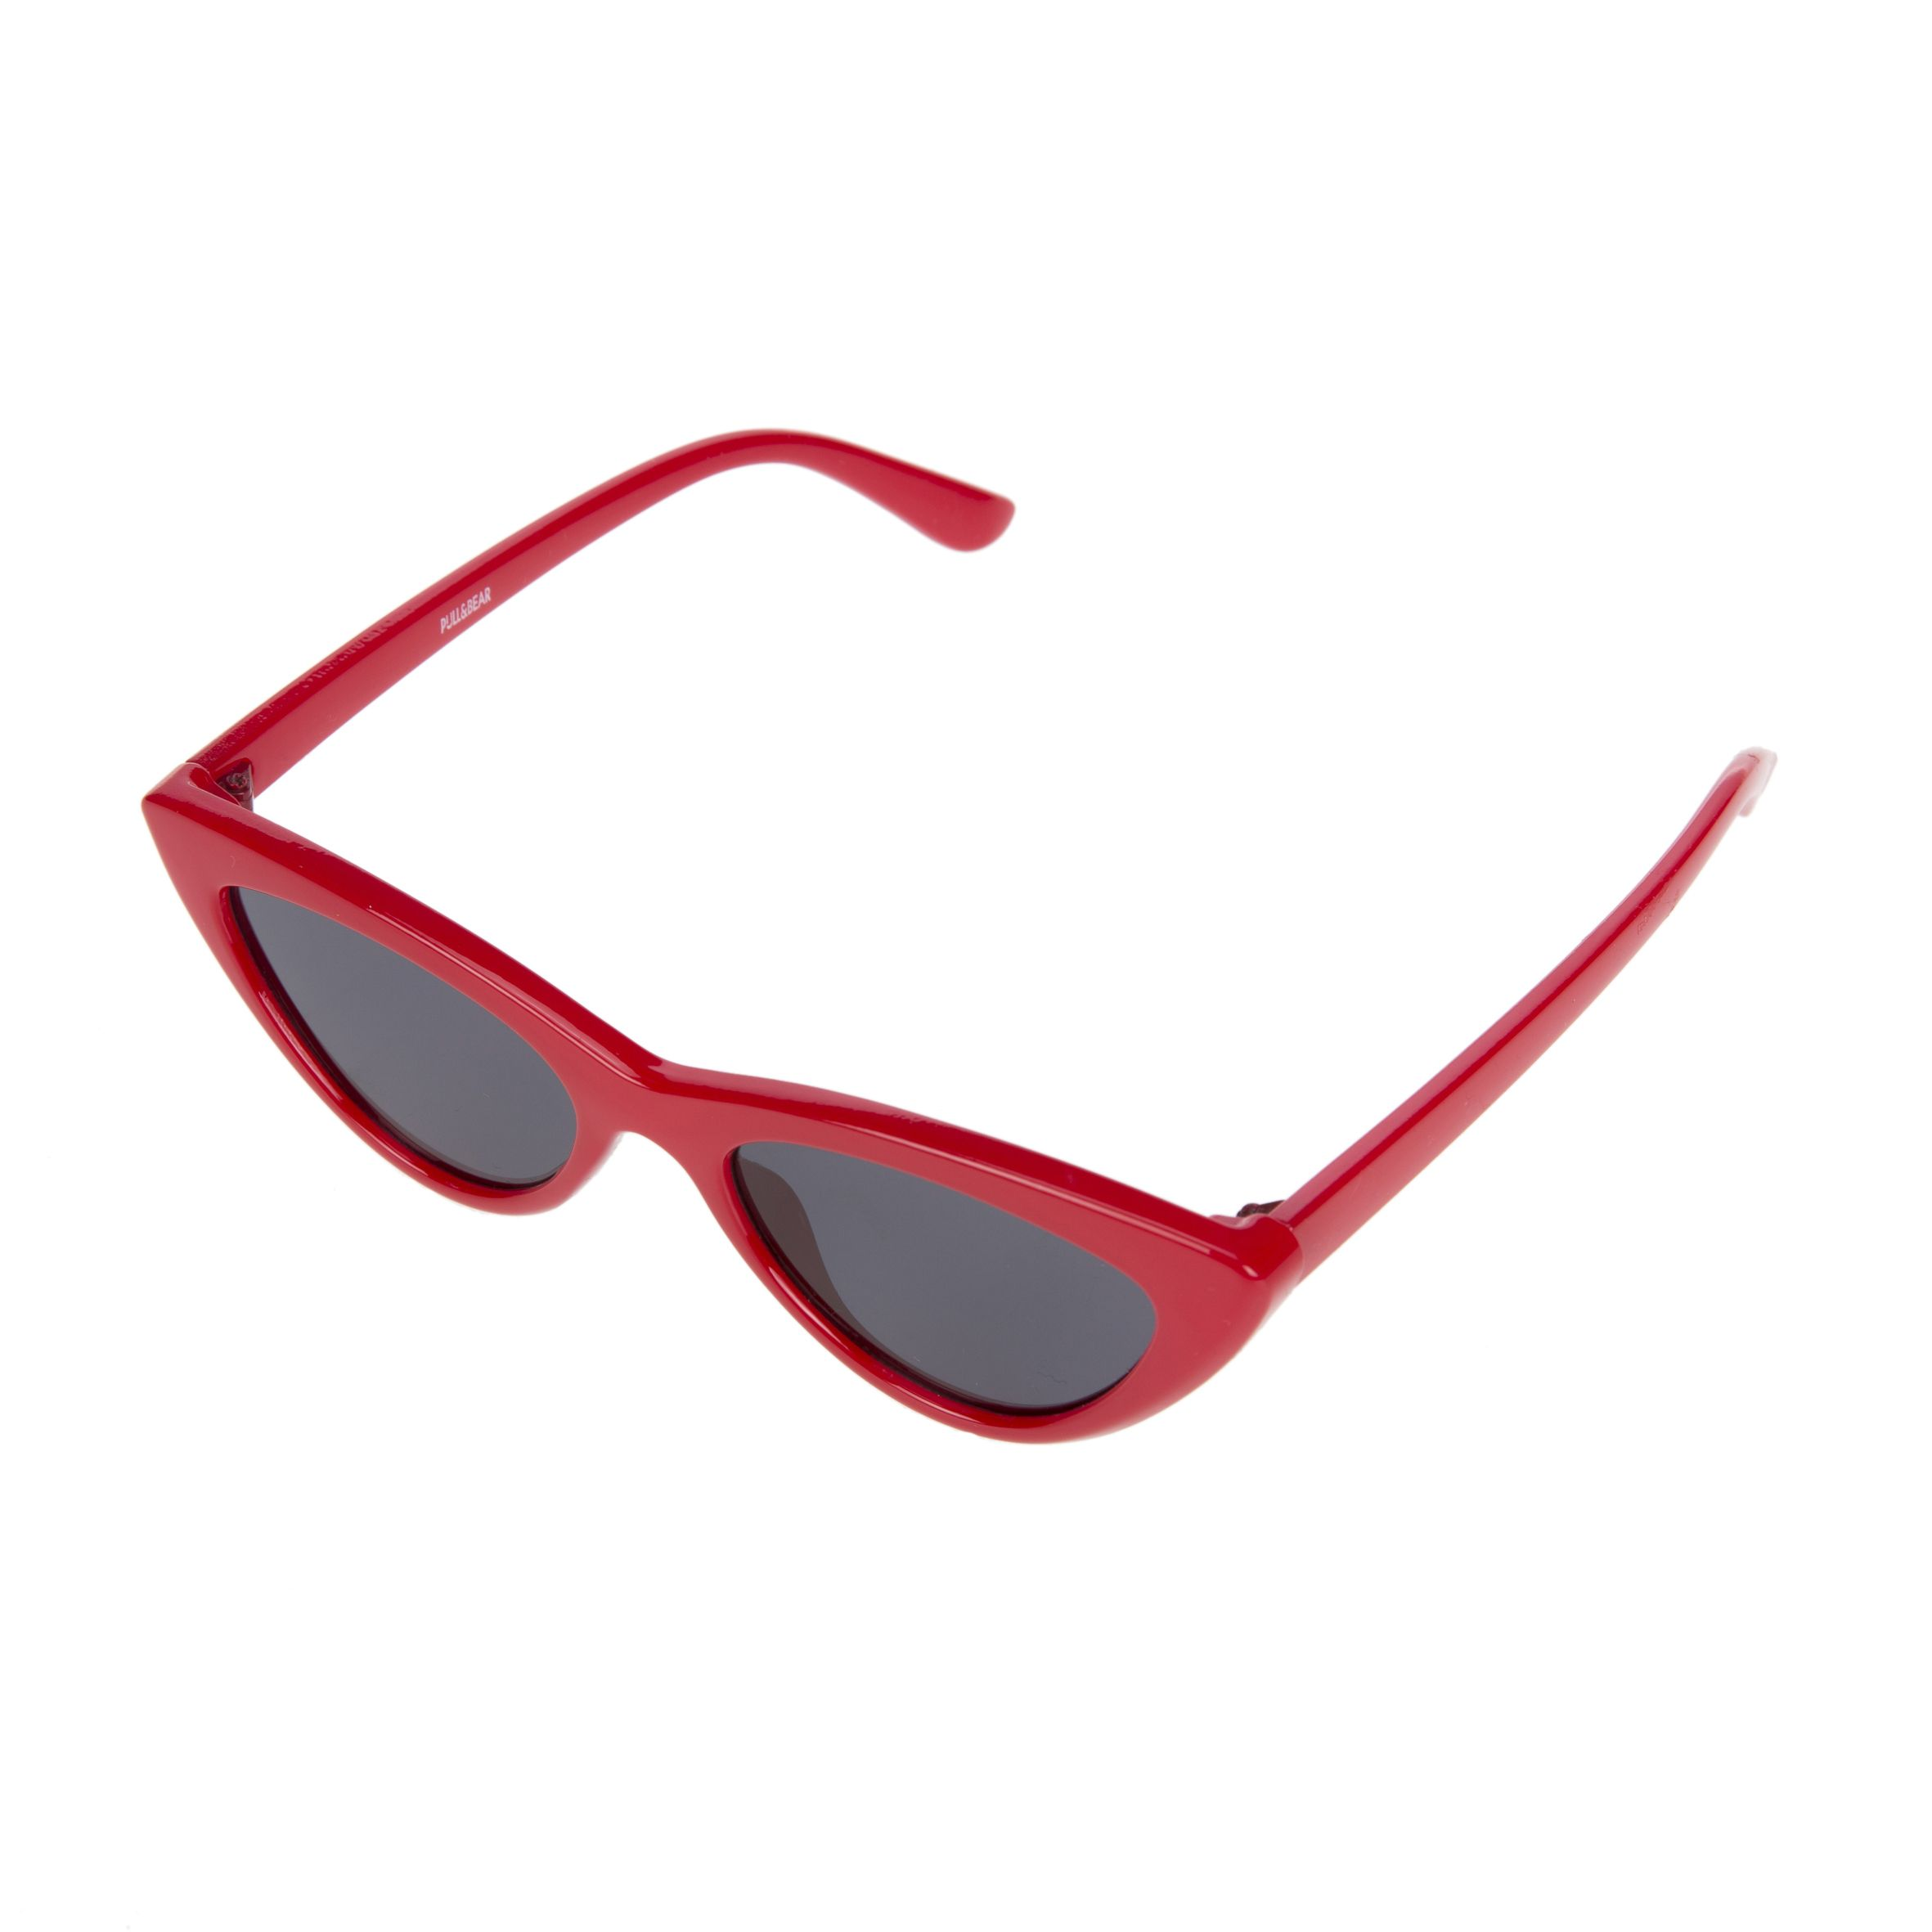 4f4040c4cd2c Gafas de sol de ojos de gato en pasta roja, de Pull & Bear Red cat ...